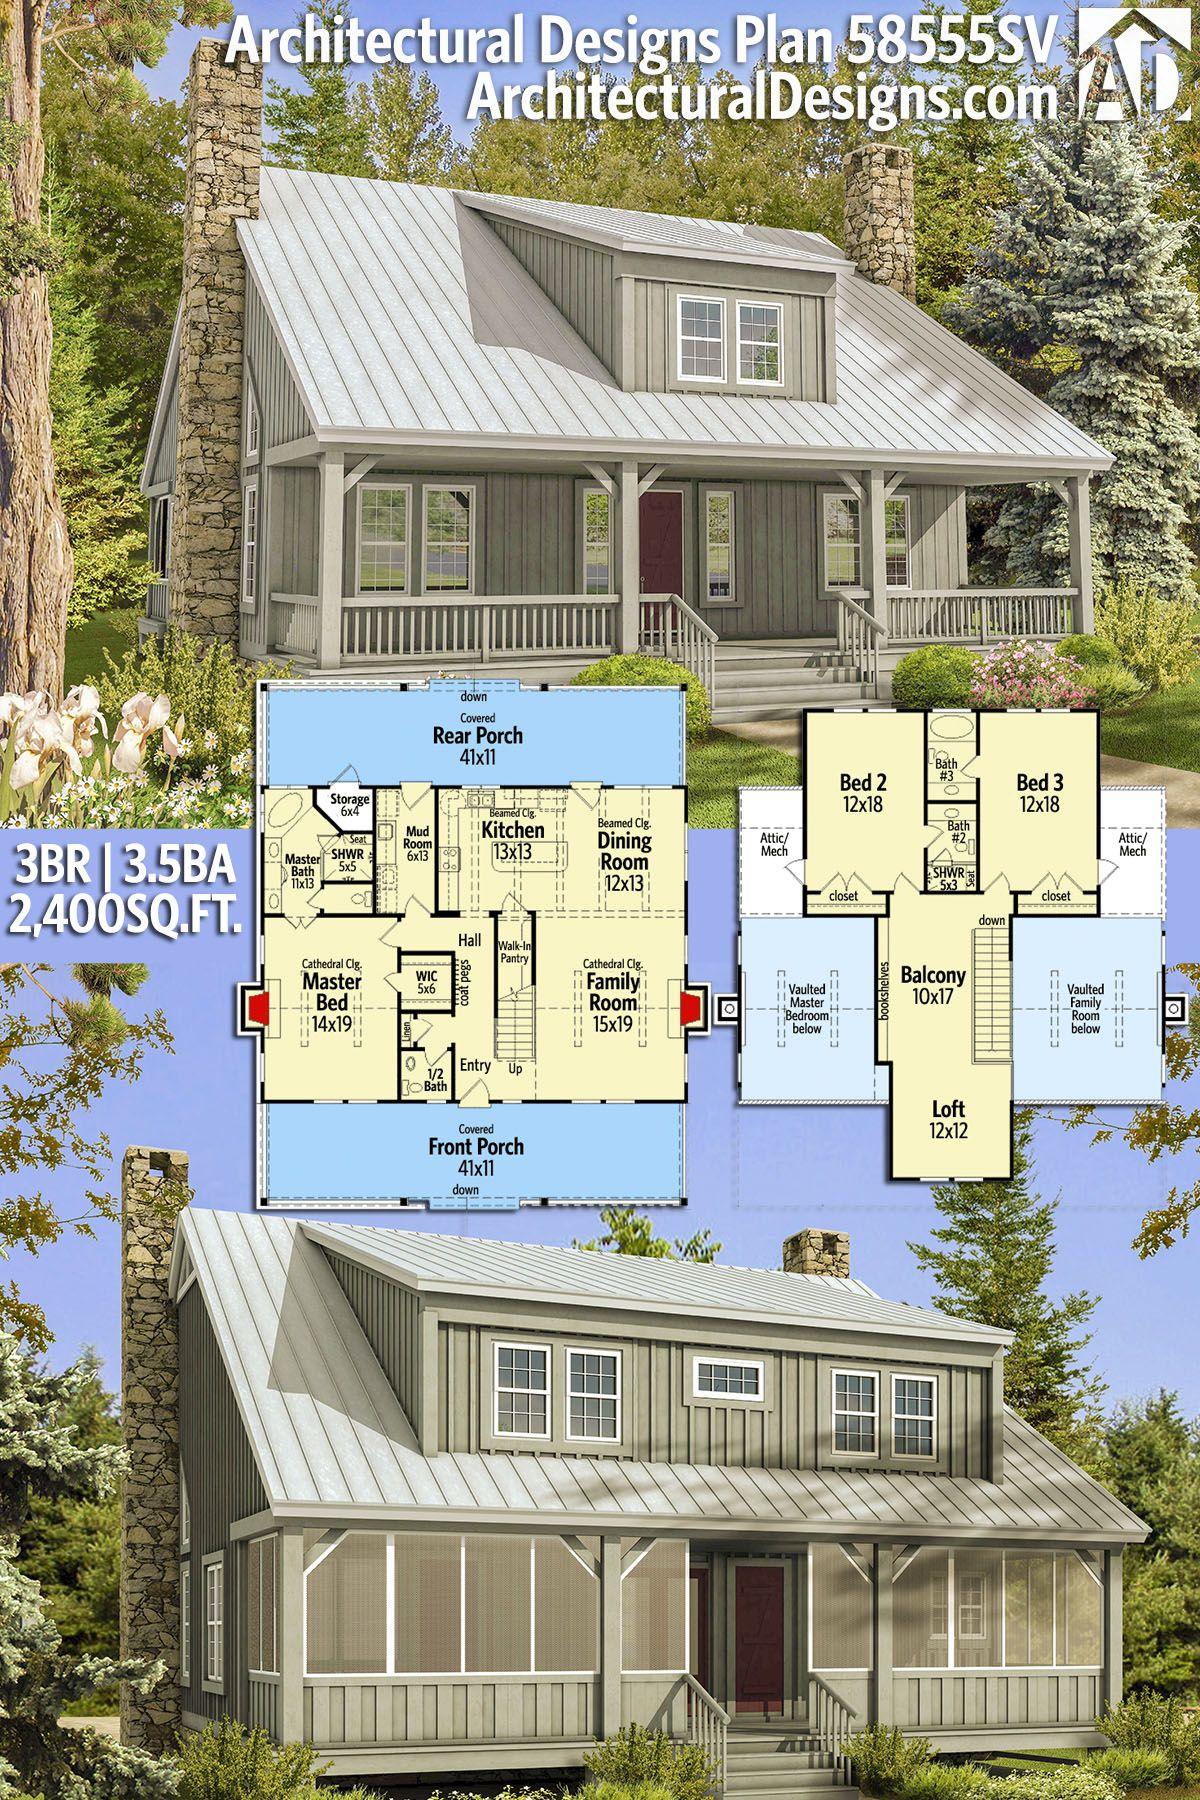 Plan 58555sv Big Rear And Front Porches Architectural Design House Plans Rustic House Plans Dream House Plans